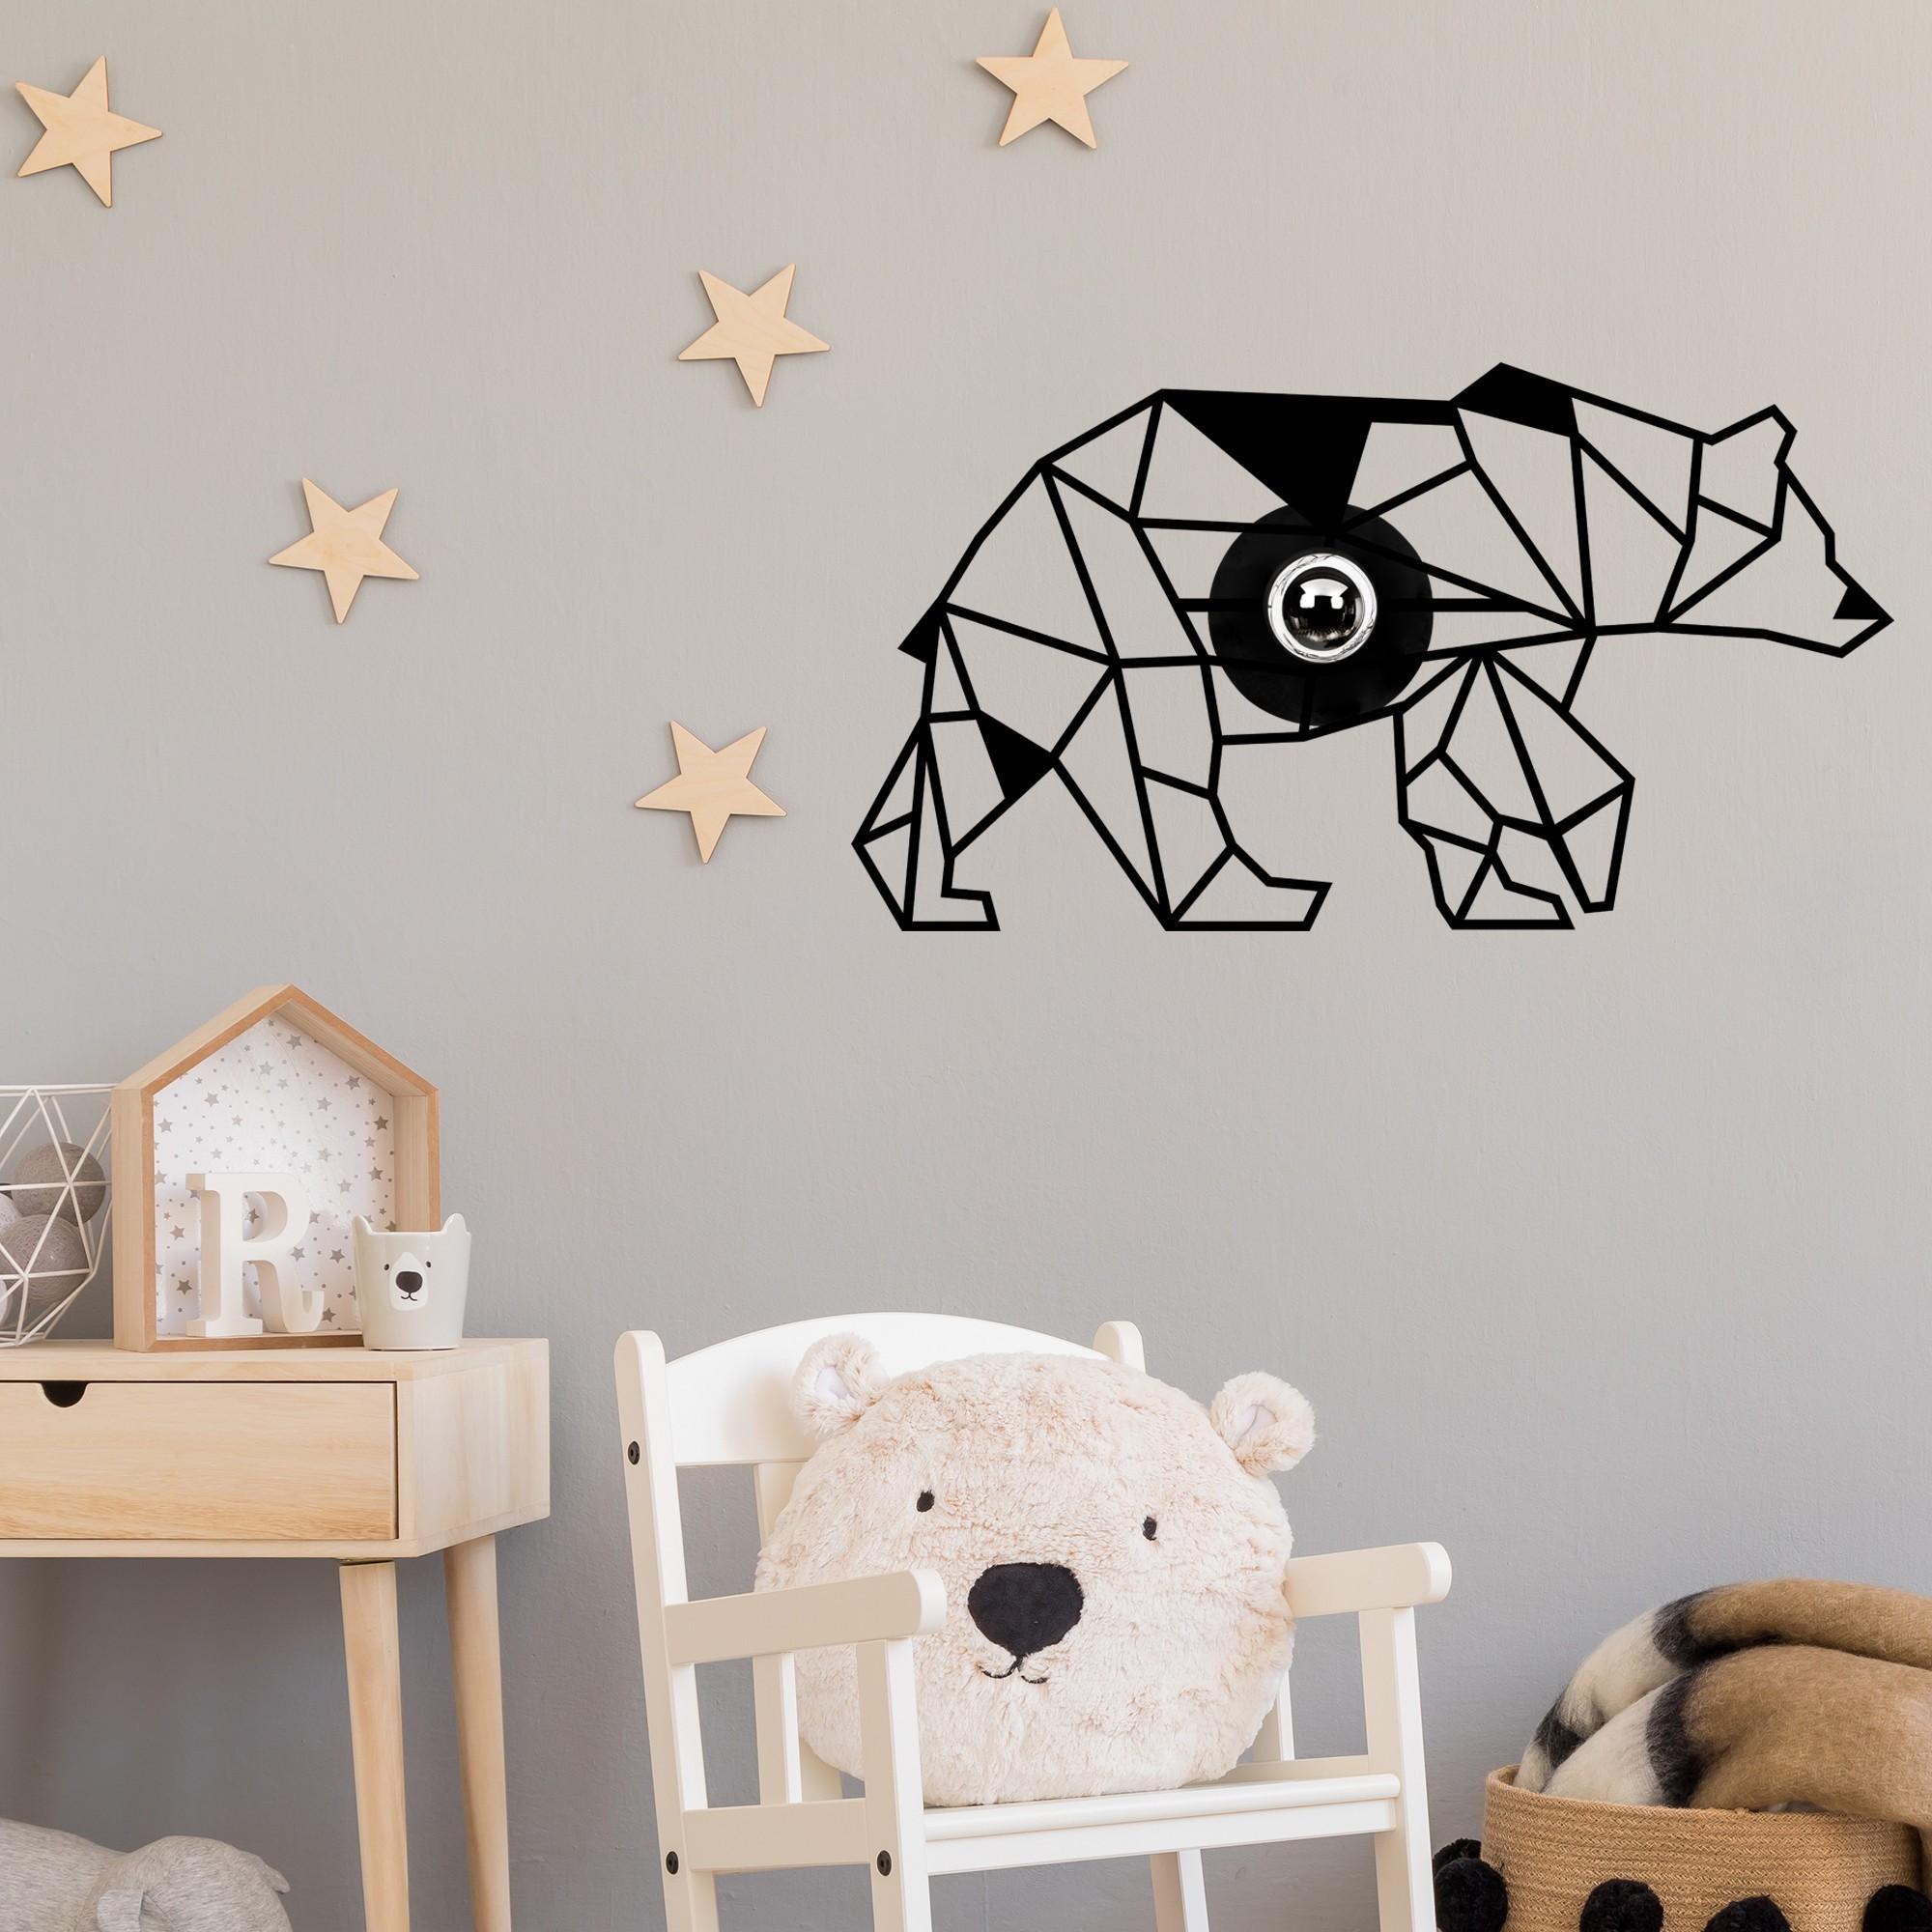 LED industriële wanddeco lamp dieren - bear - dimbaar - E27 fitting - sfeerfoto